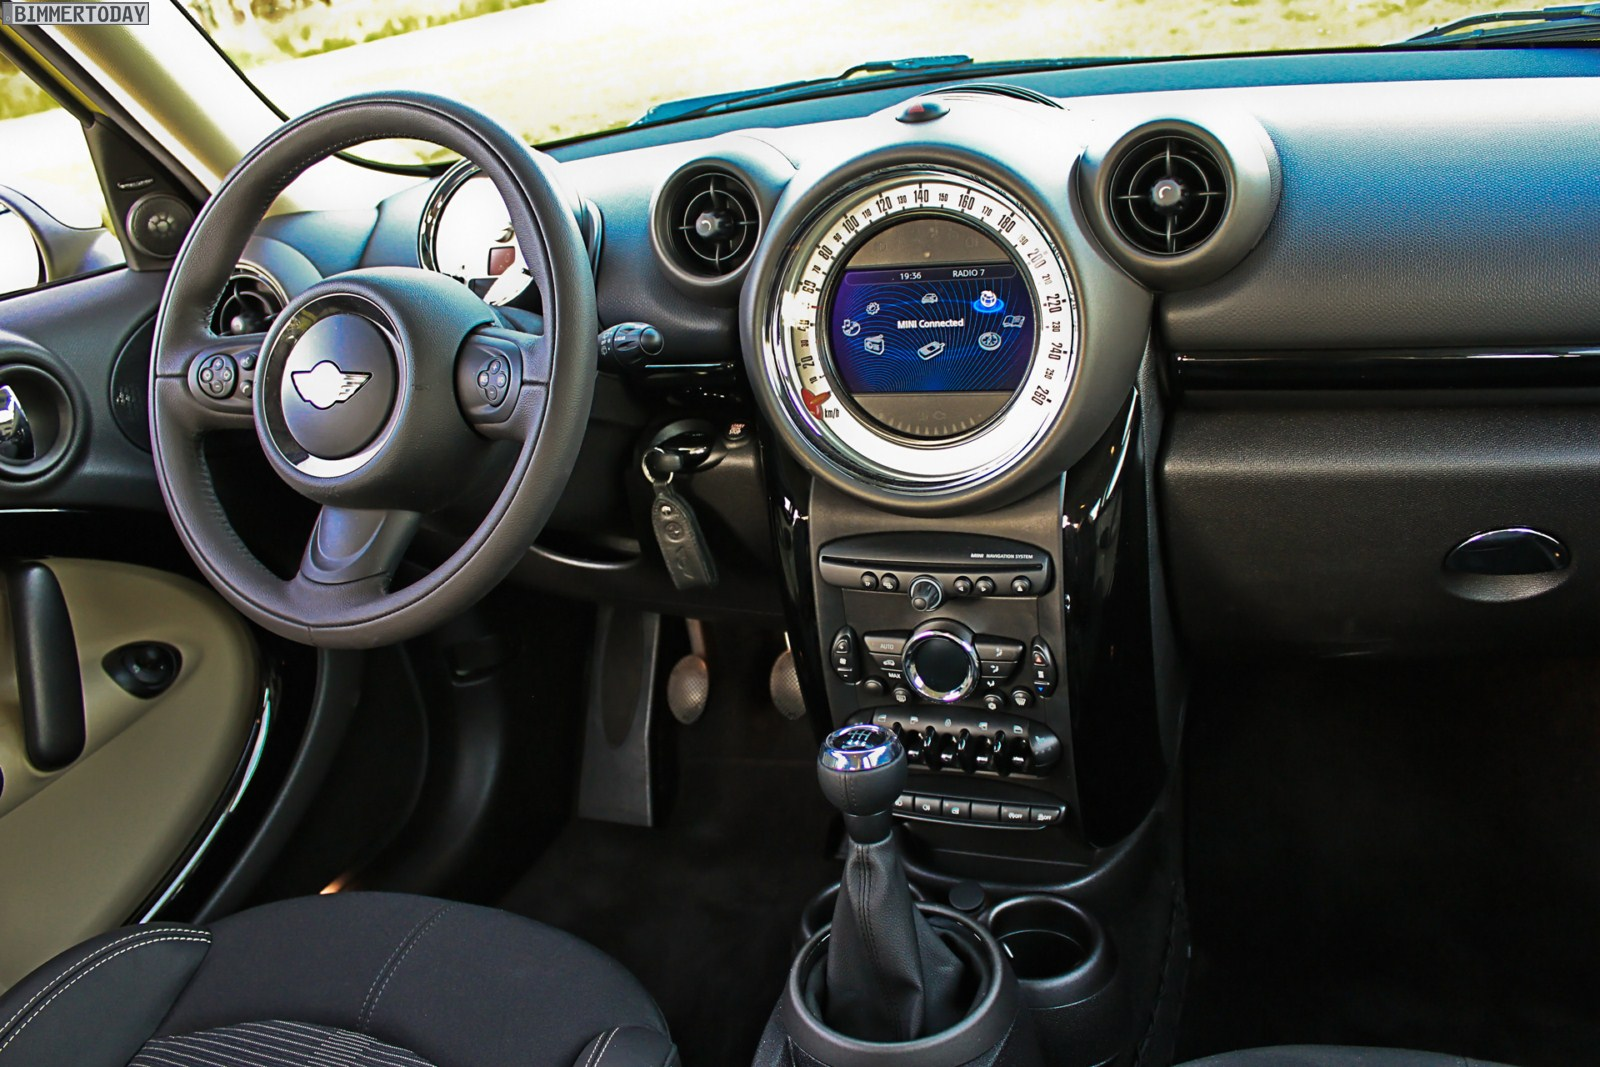 Bmw Mini Cooper >> Alle Viere im Test: Fahrbericht zum MINI Cooper D ALL4